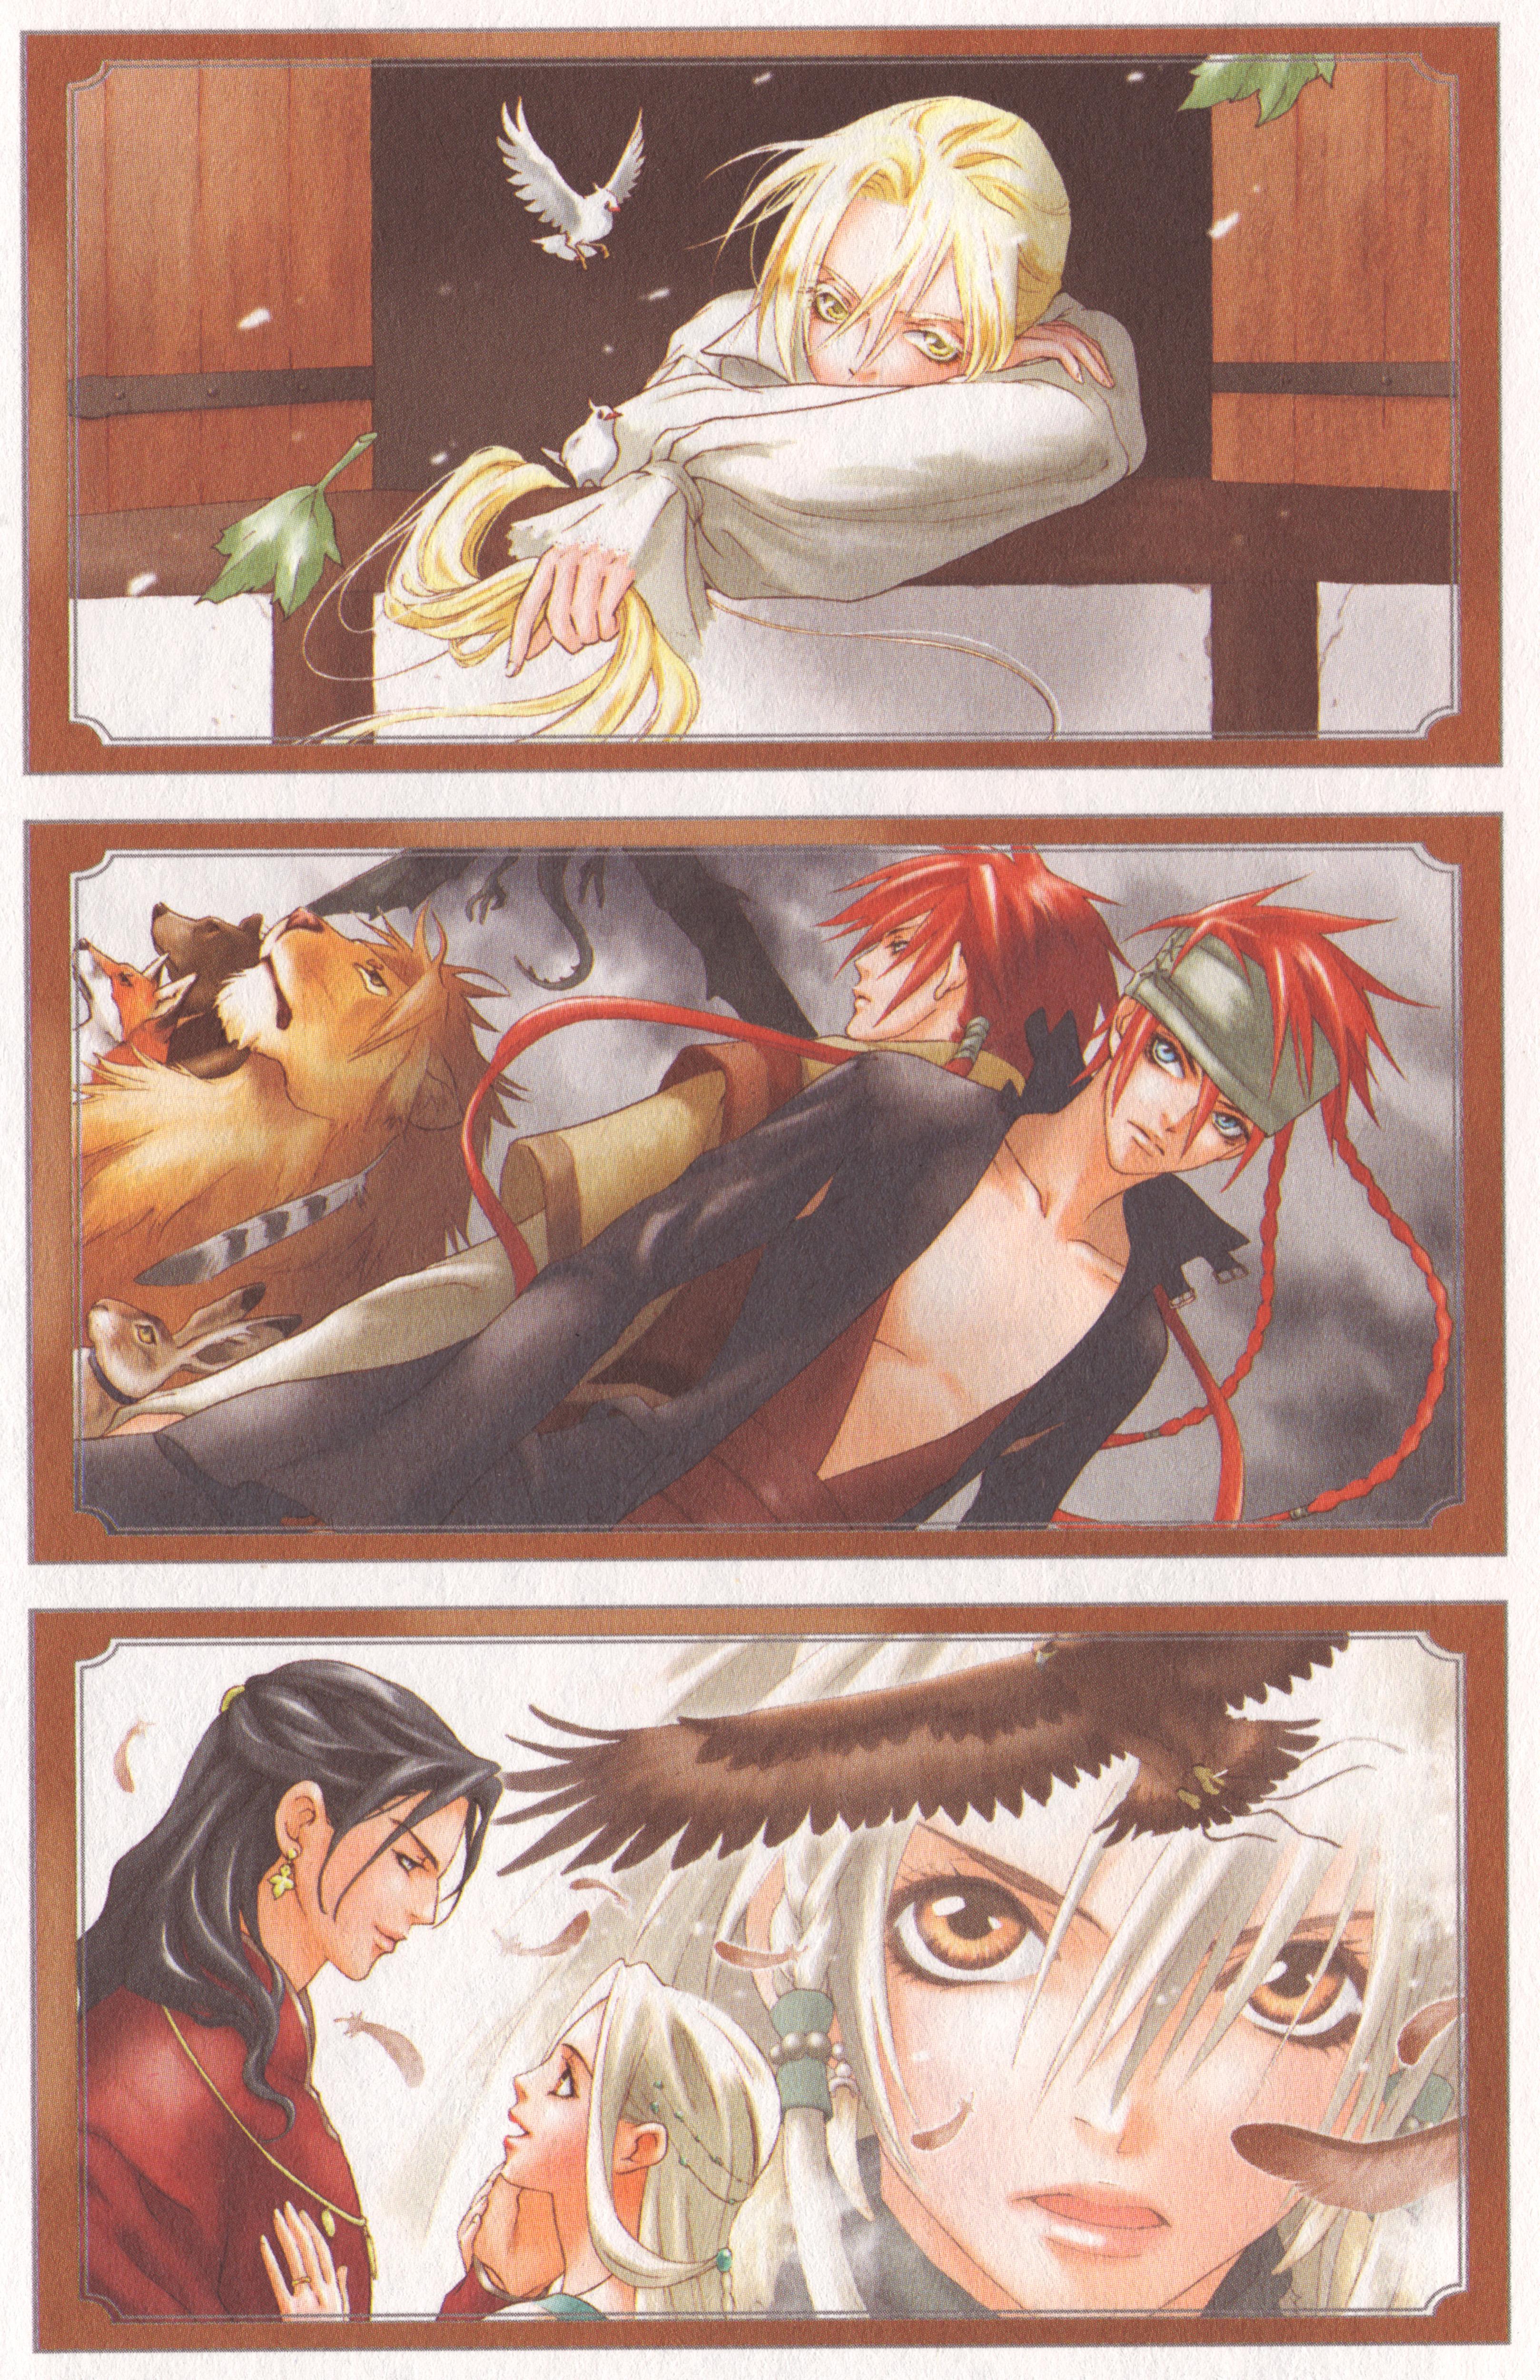 Grimms Manga: Grimms Manga 3 - Minitokyo